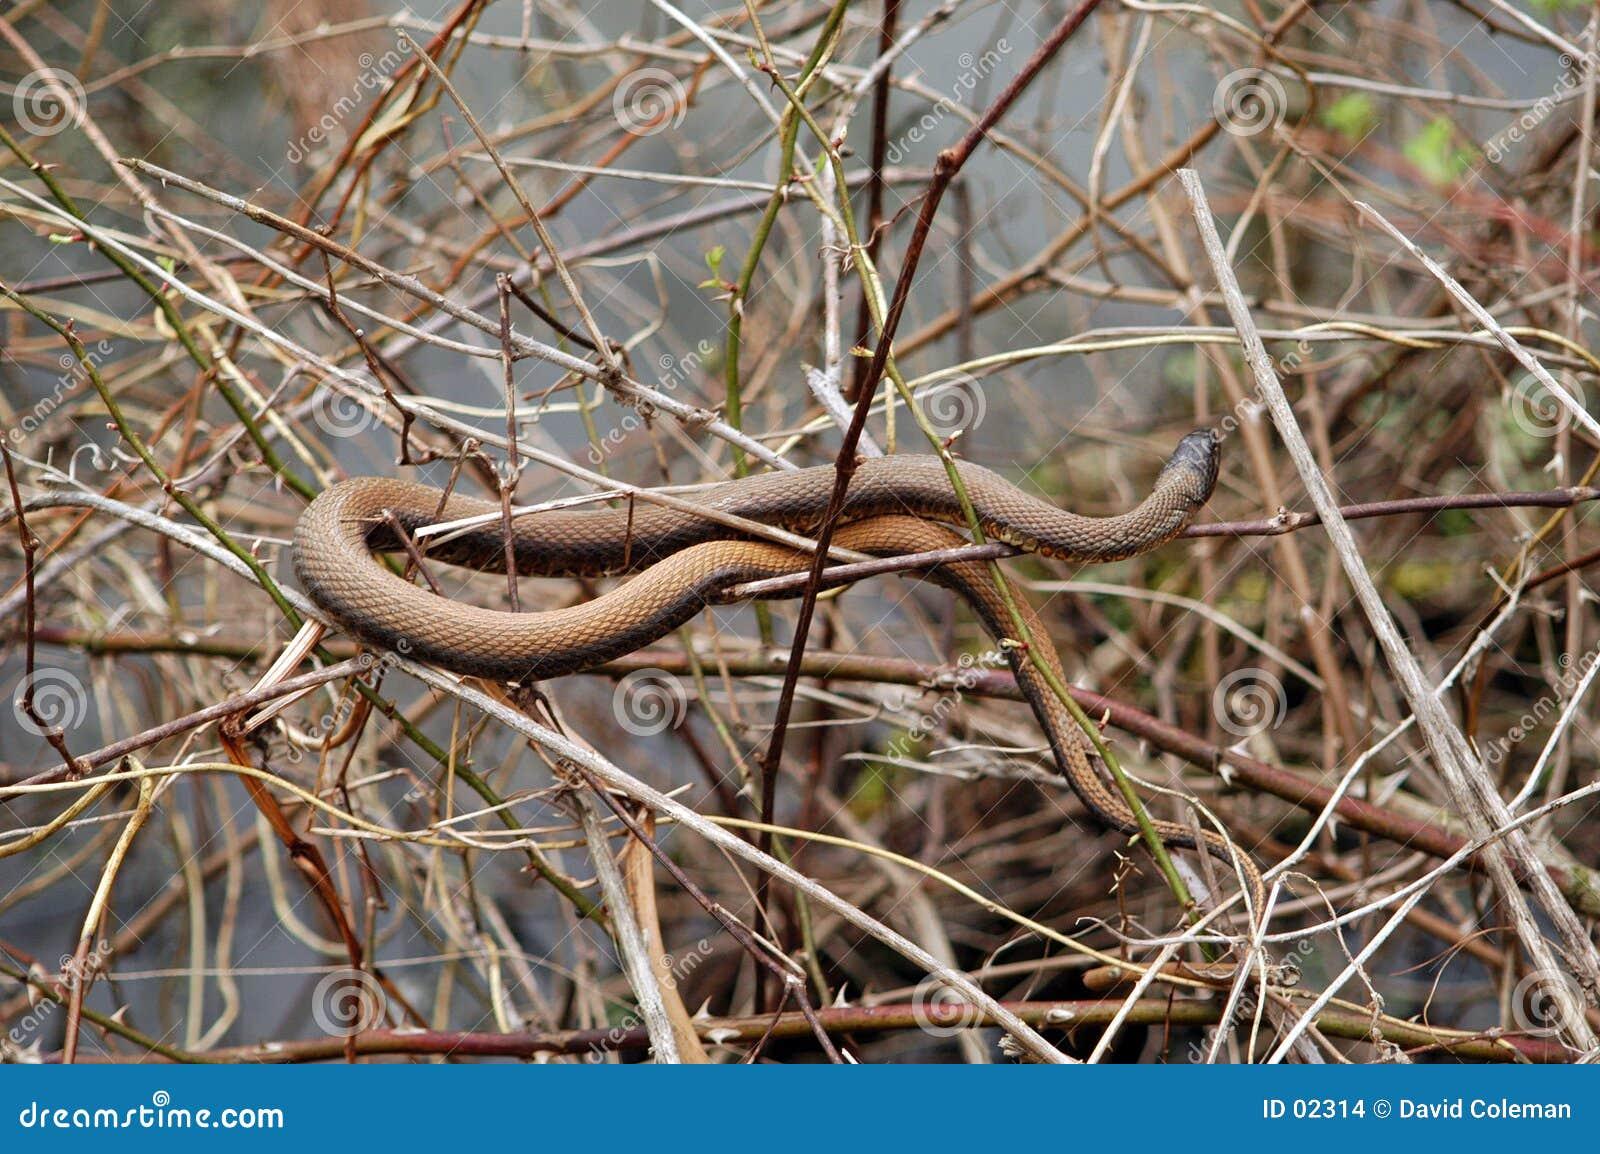 Snake brown